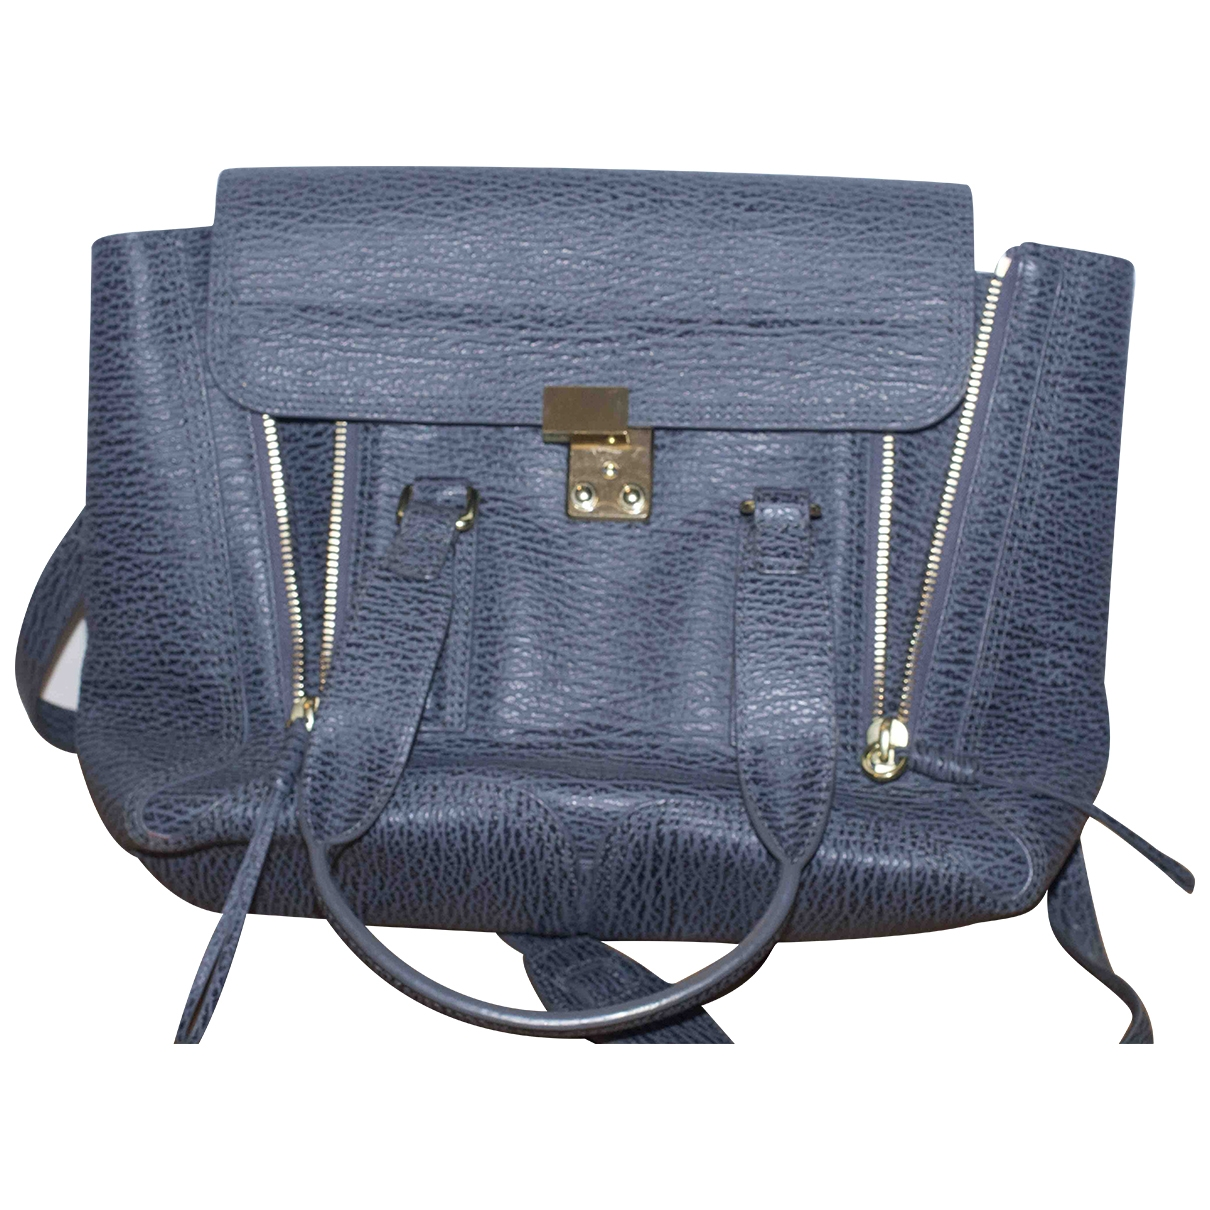 3.1 Phillip Lim Pashli Grey Leather handbag for Women \N